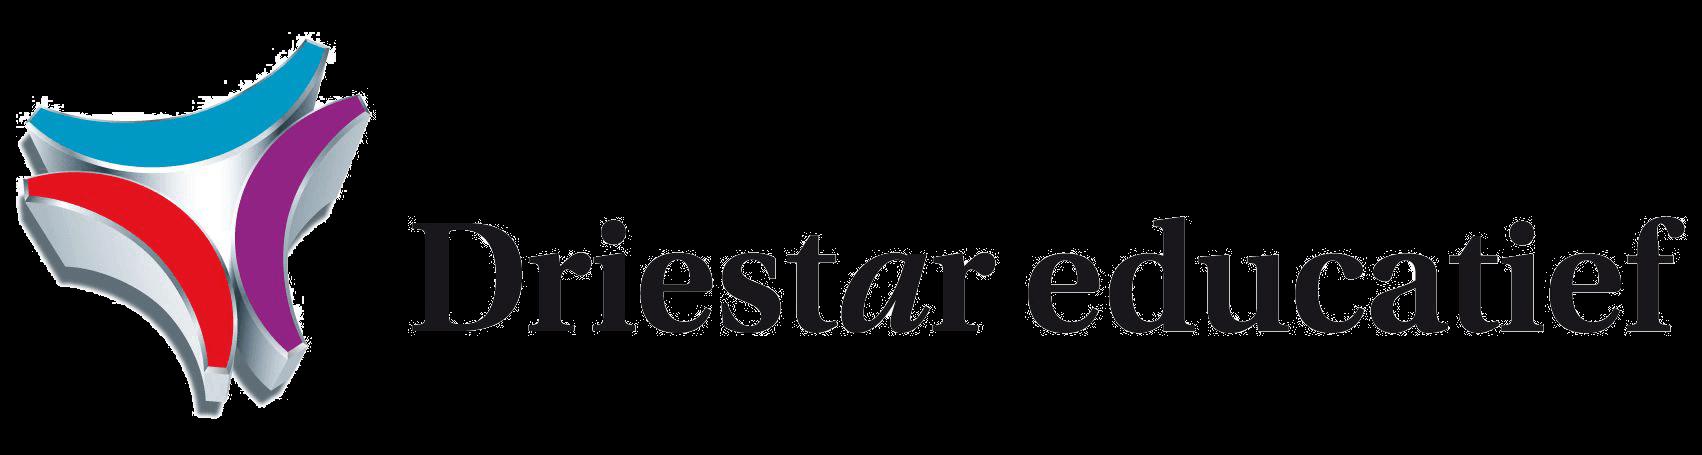 logo driestar educatief